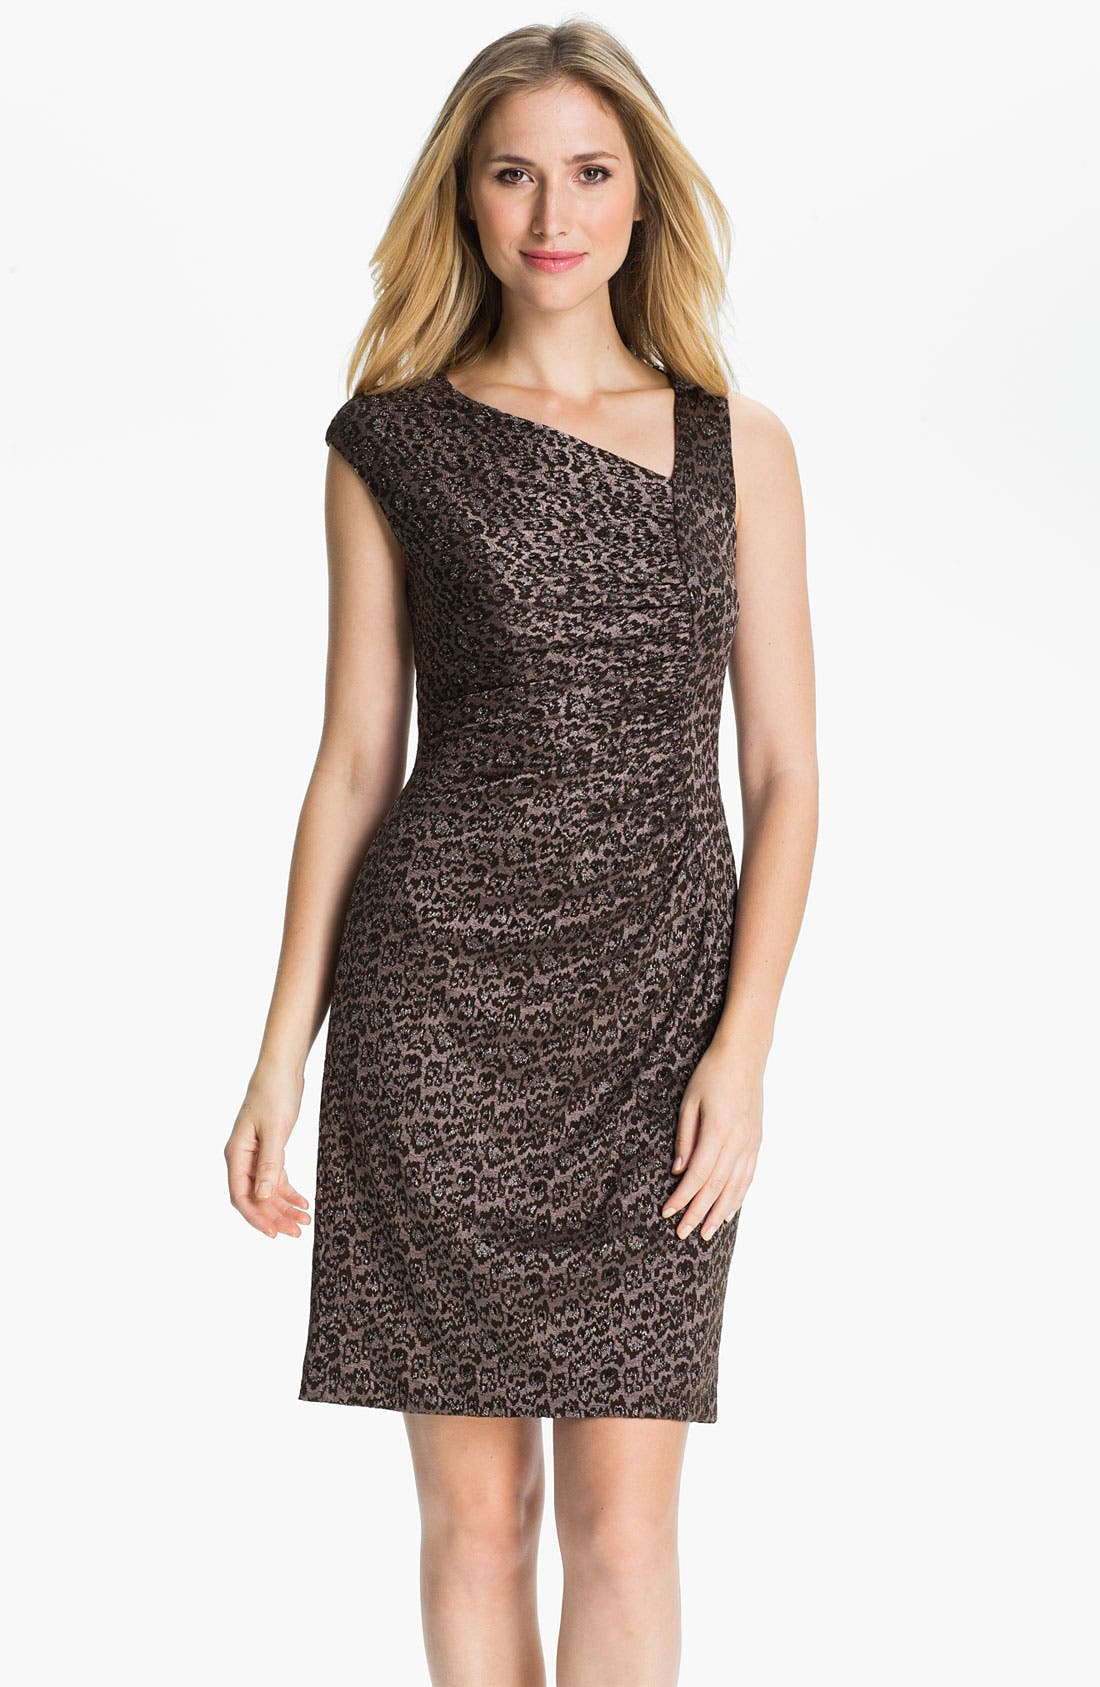 Alternate Image 1 Selected - Adrianna Papell Asymmetrical Neck Textured Sheath Dress